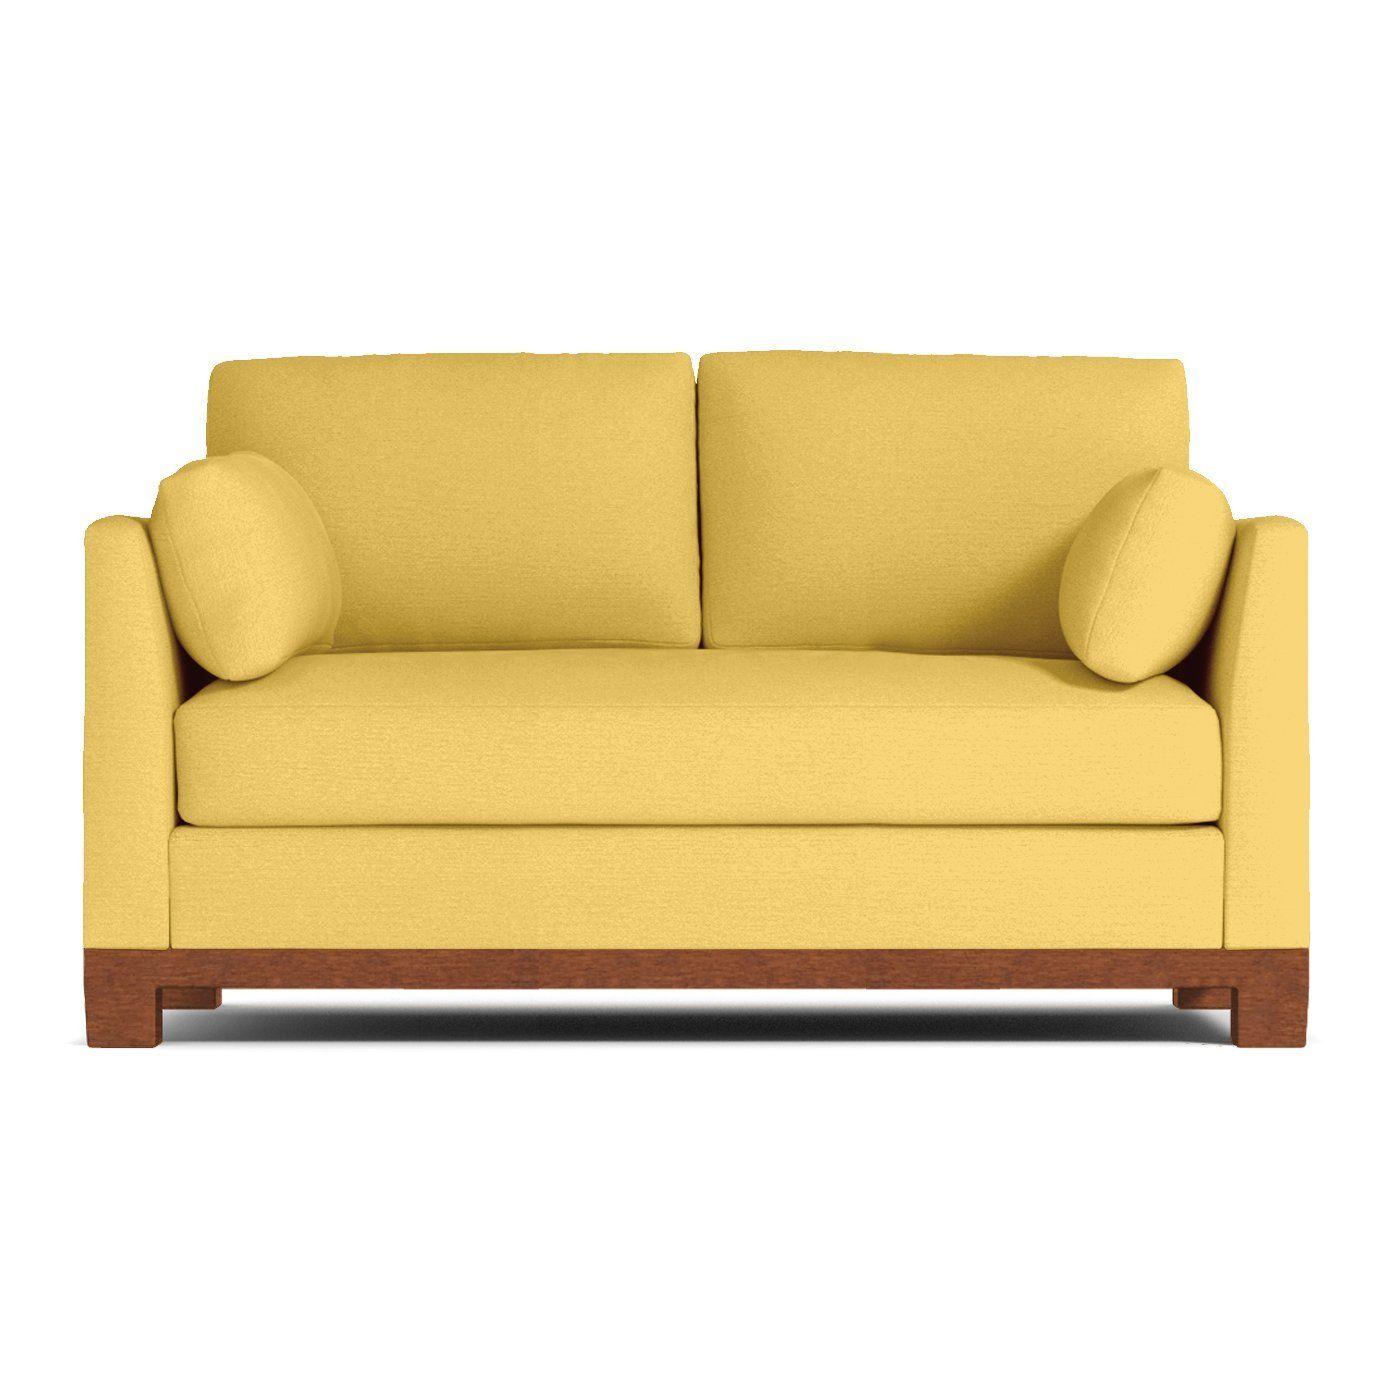 awesome Apartment Size Sleeper Sofa , Luxury Apartment Size Sleep ...